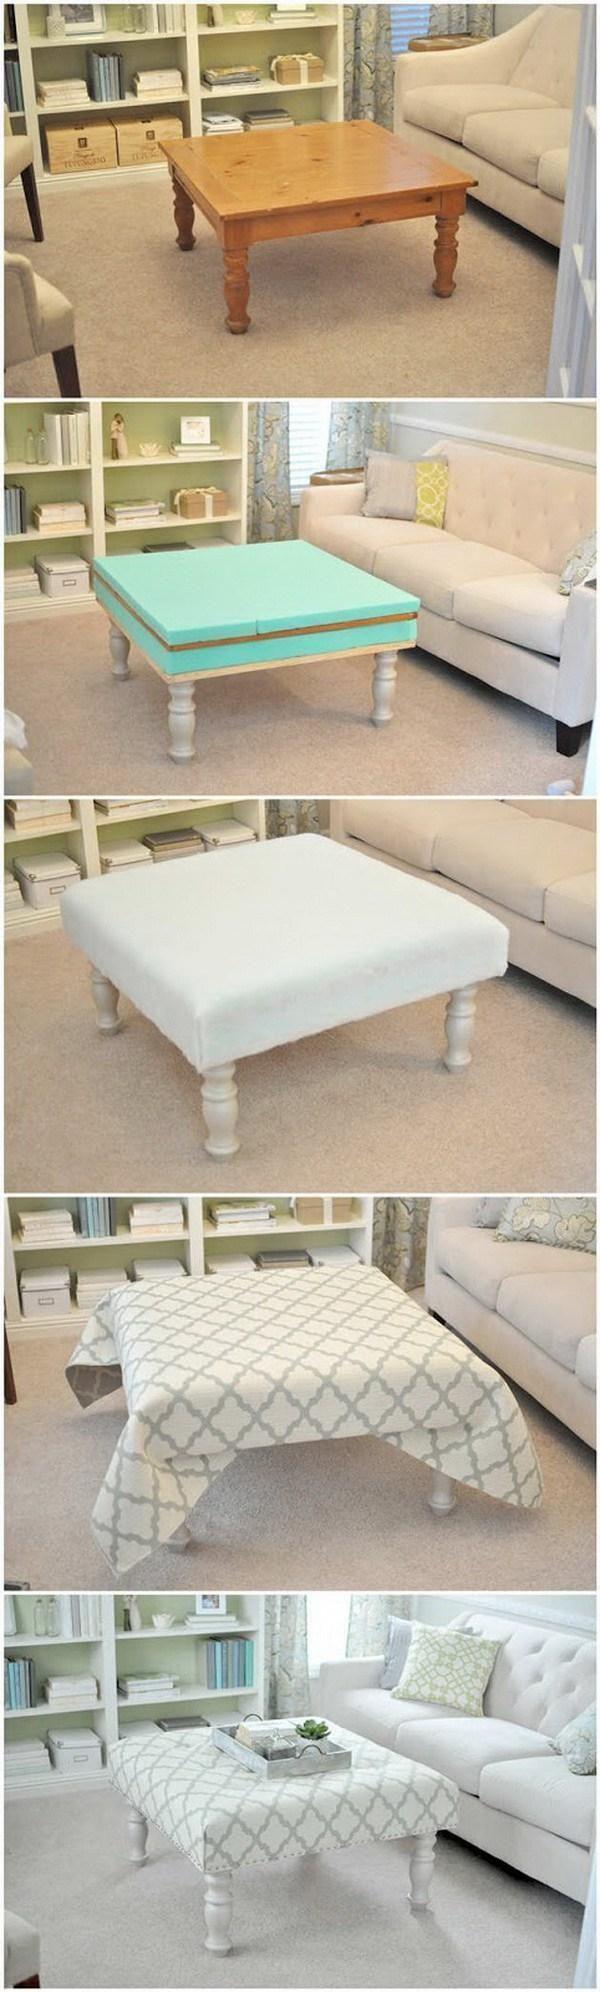 20 DIY Ideas to Reuse Old Furniture